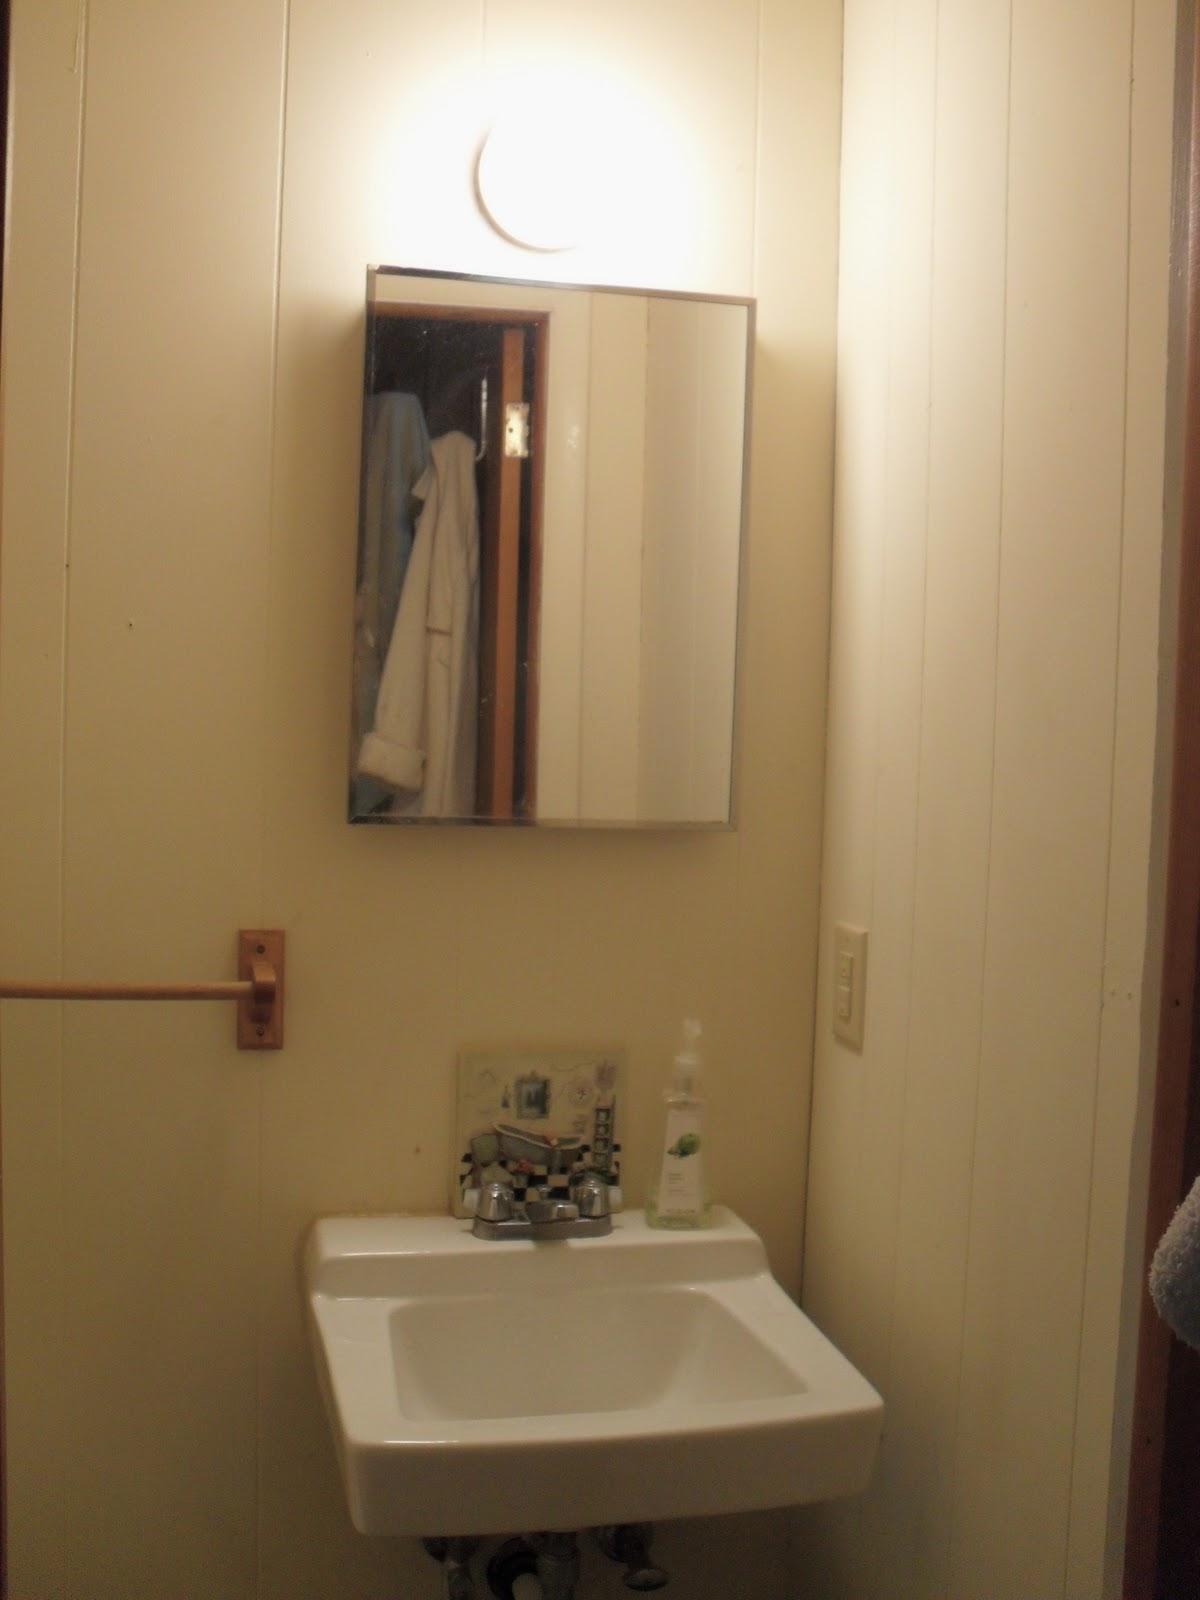 Updating bathroom